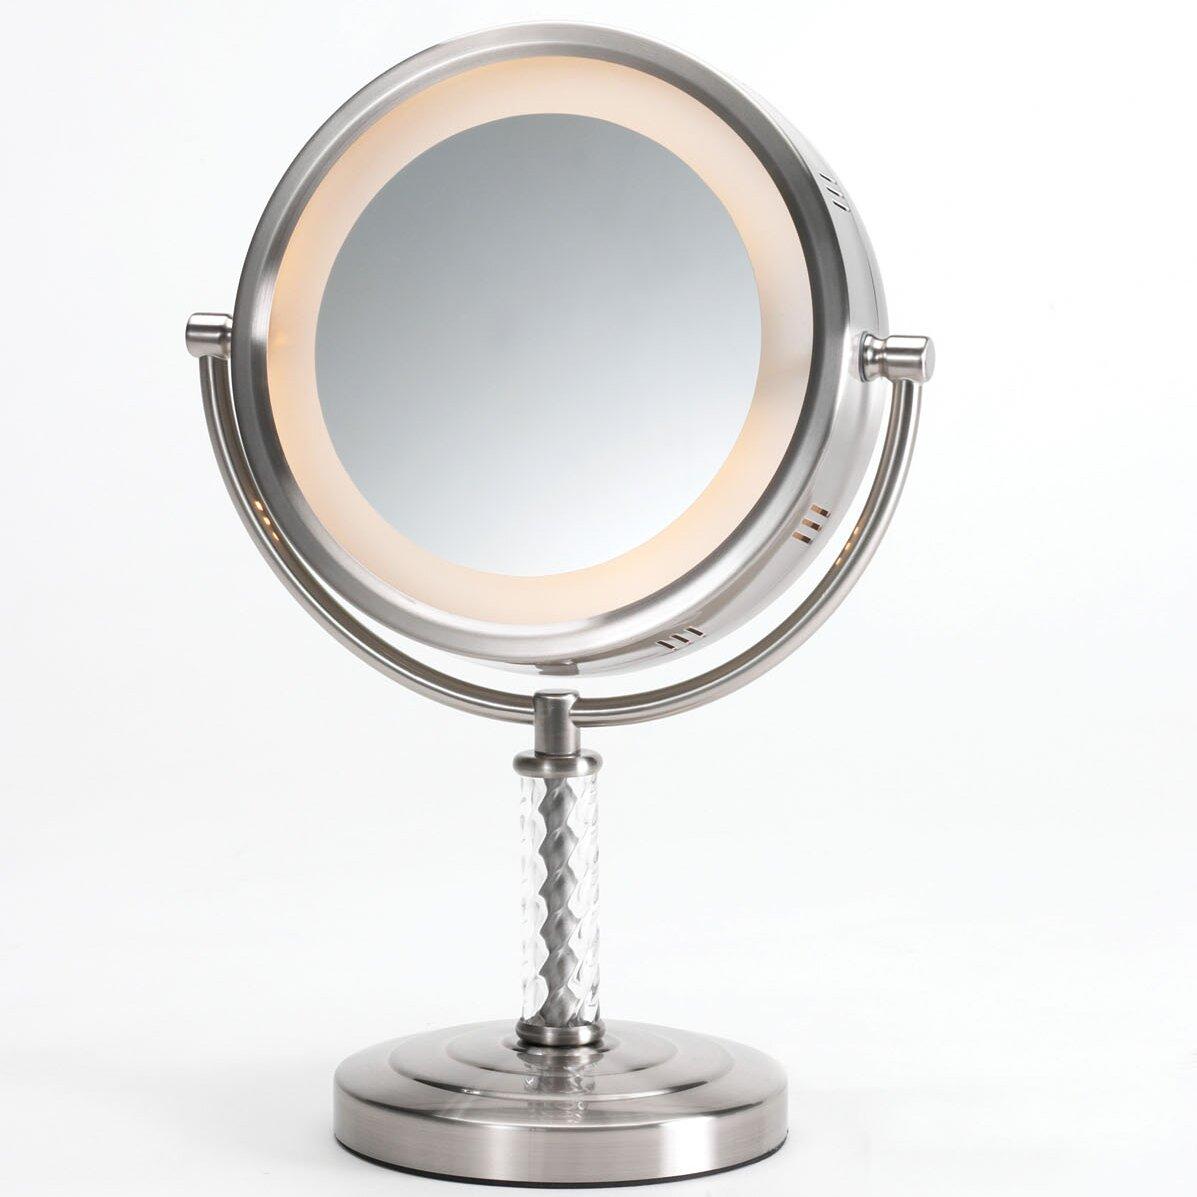 Lighted Vanity Mirror Reviews : Jerdon Dual Sided Halo Lighted Vanity Mirror & Reviews Wayfair